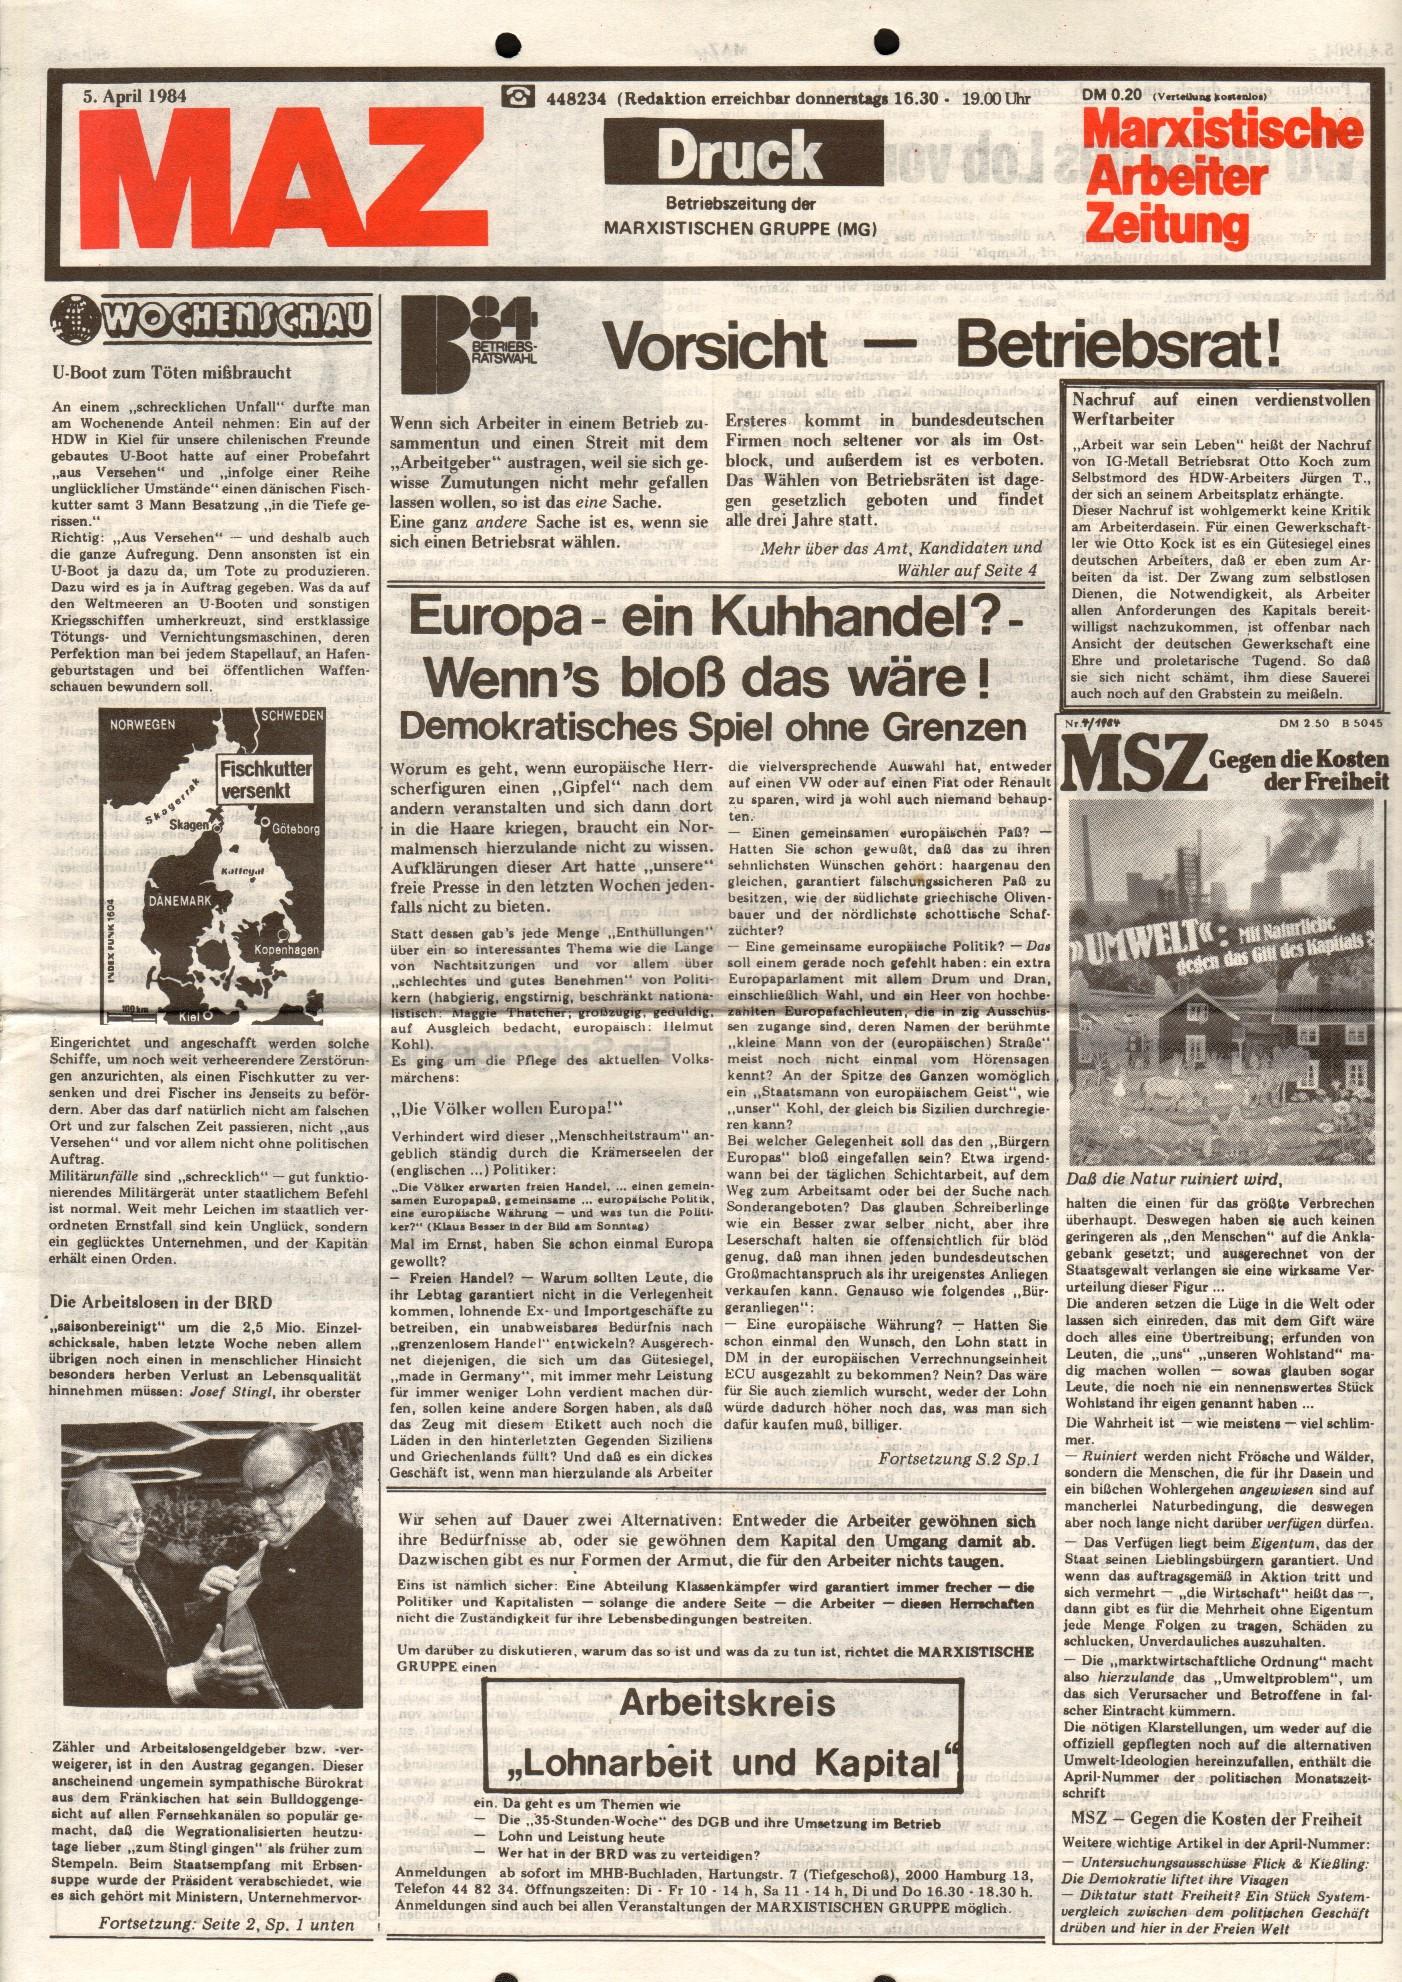 Hamburg_MG_MAZ_Druck_19840405_01